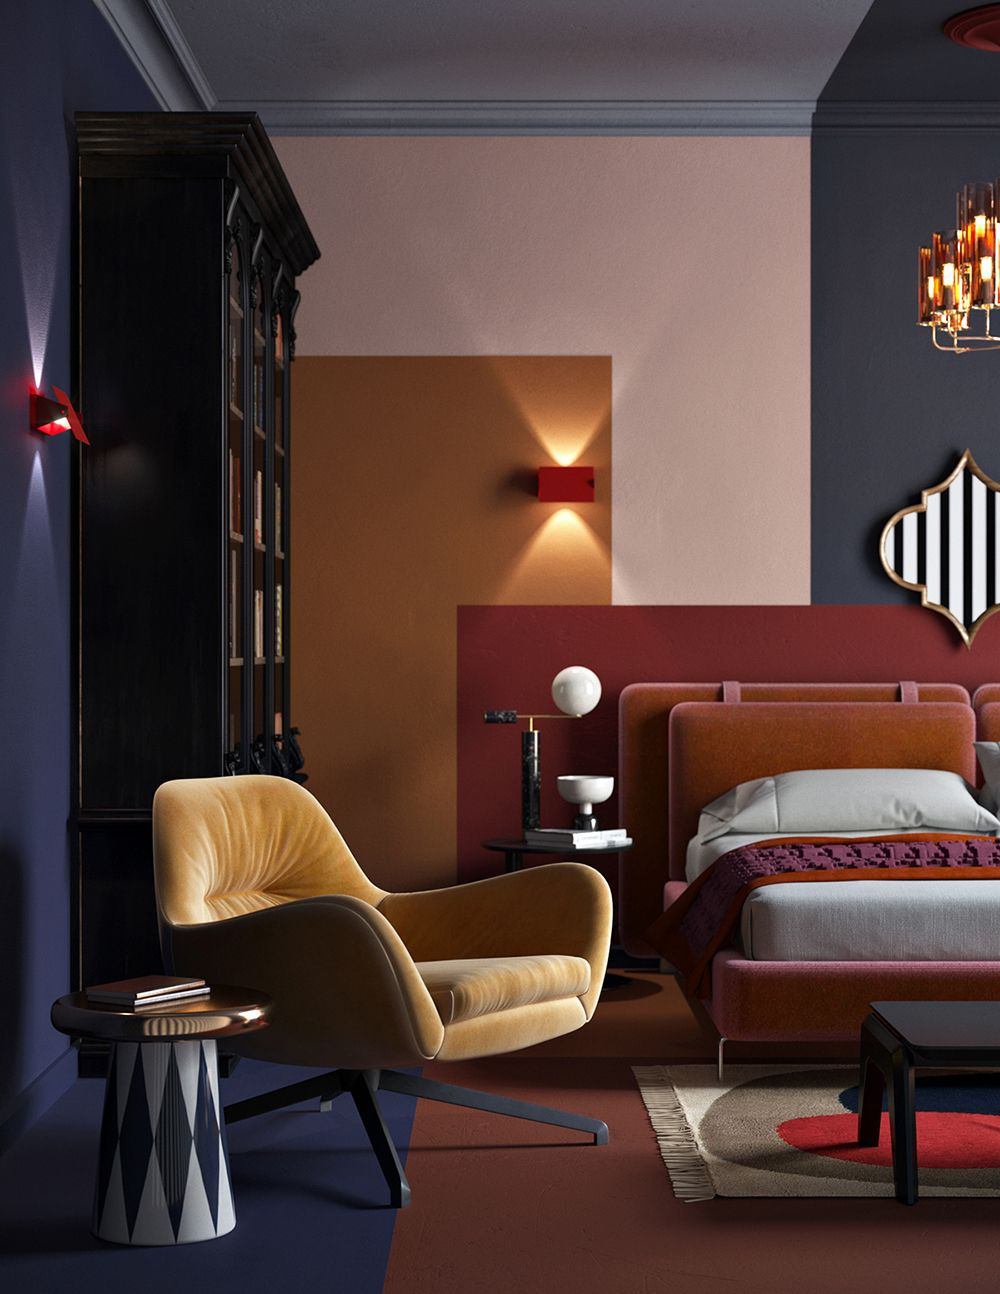 15 Refined and Modern Living Room Ideas Interior design